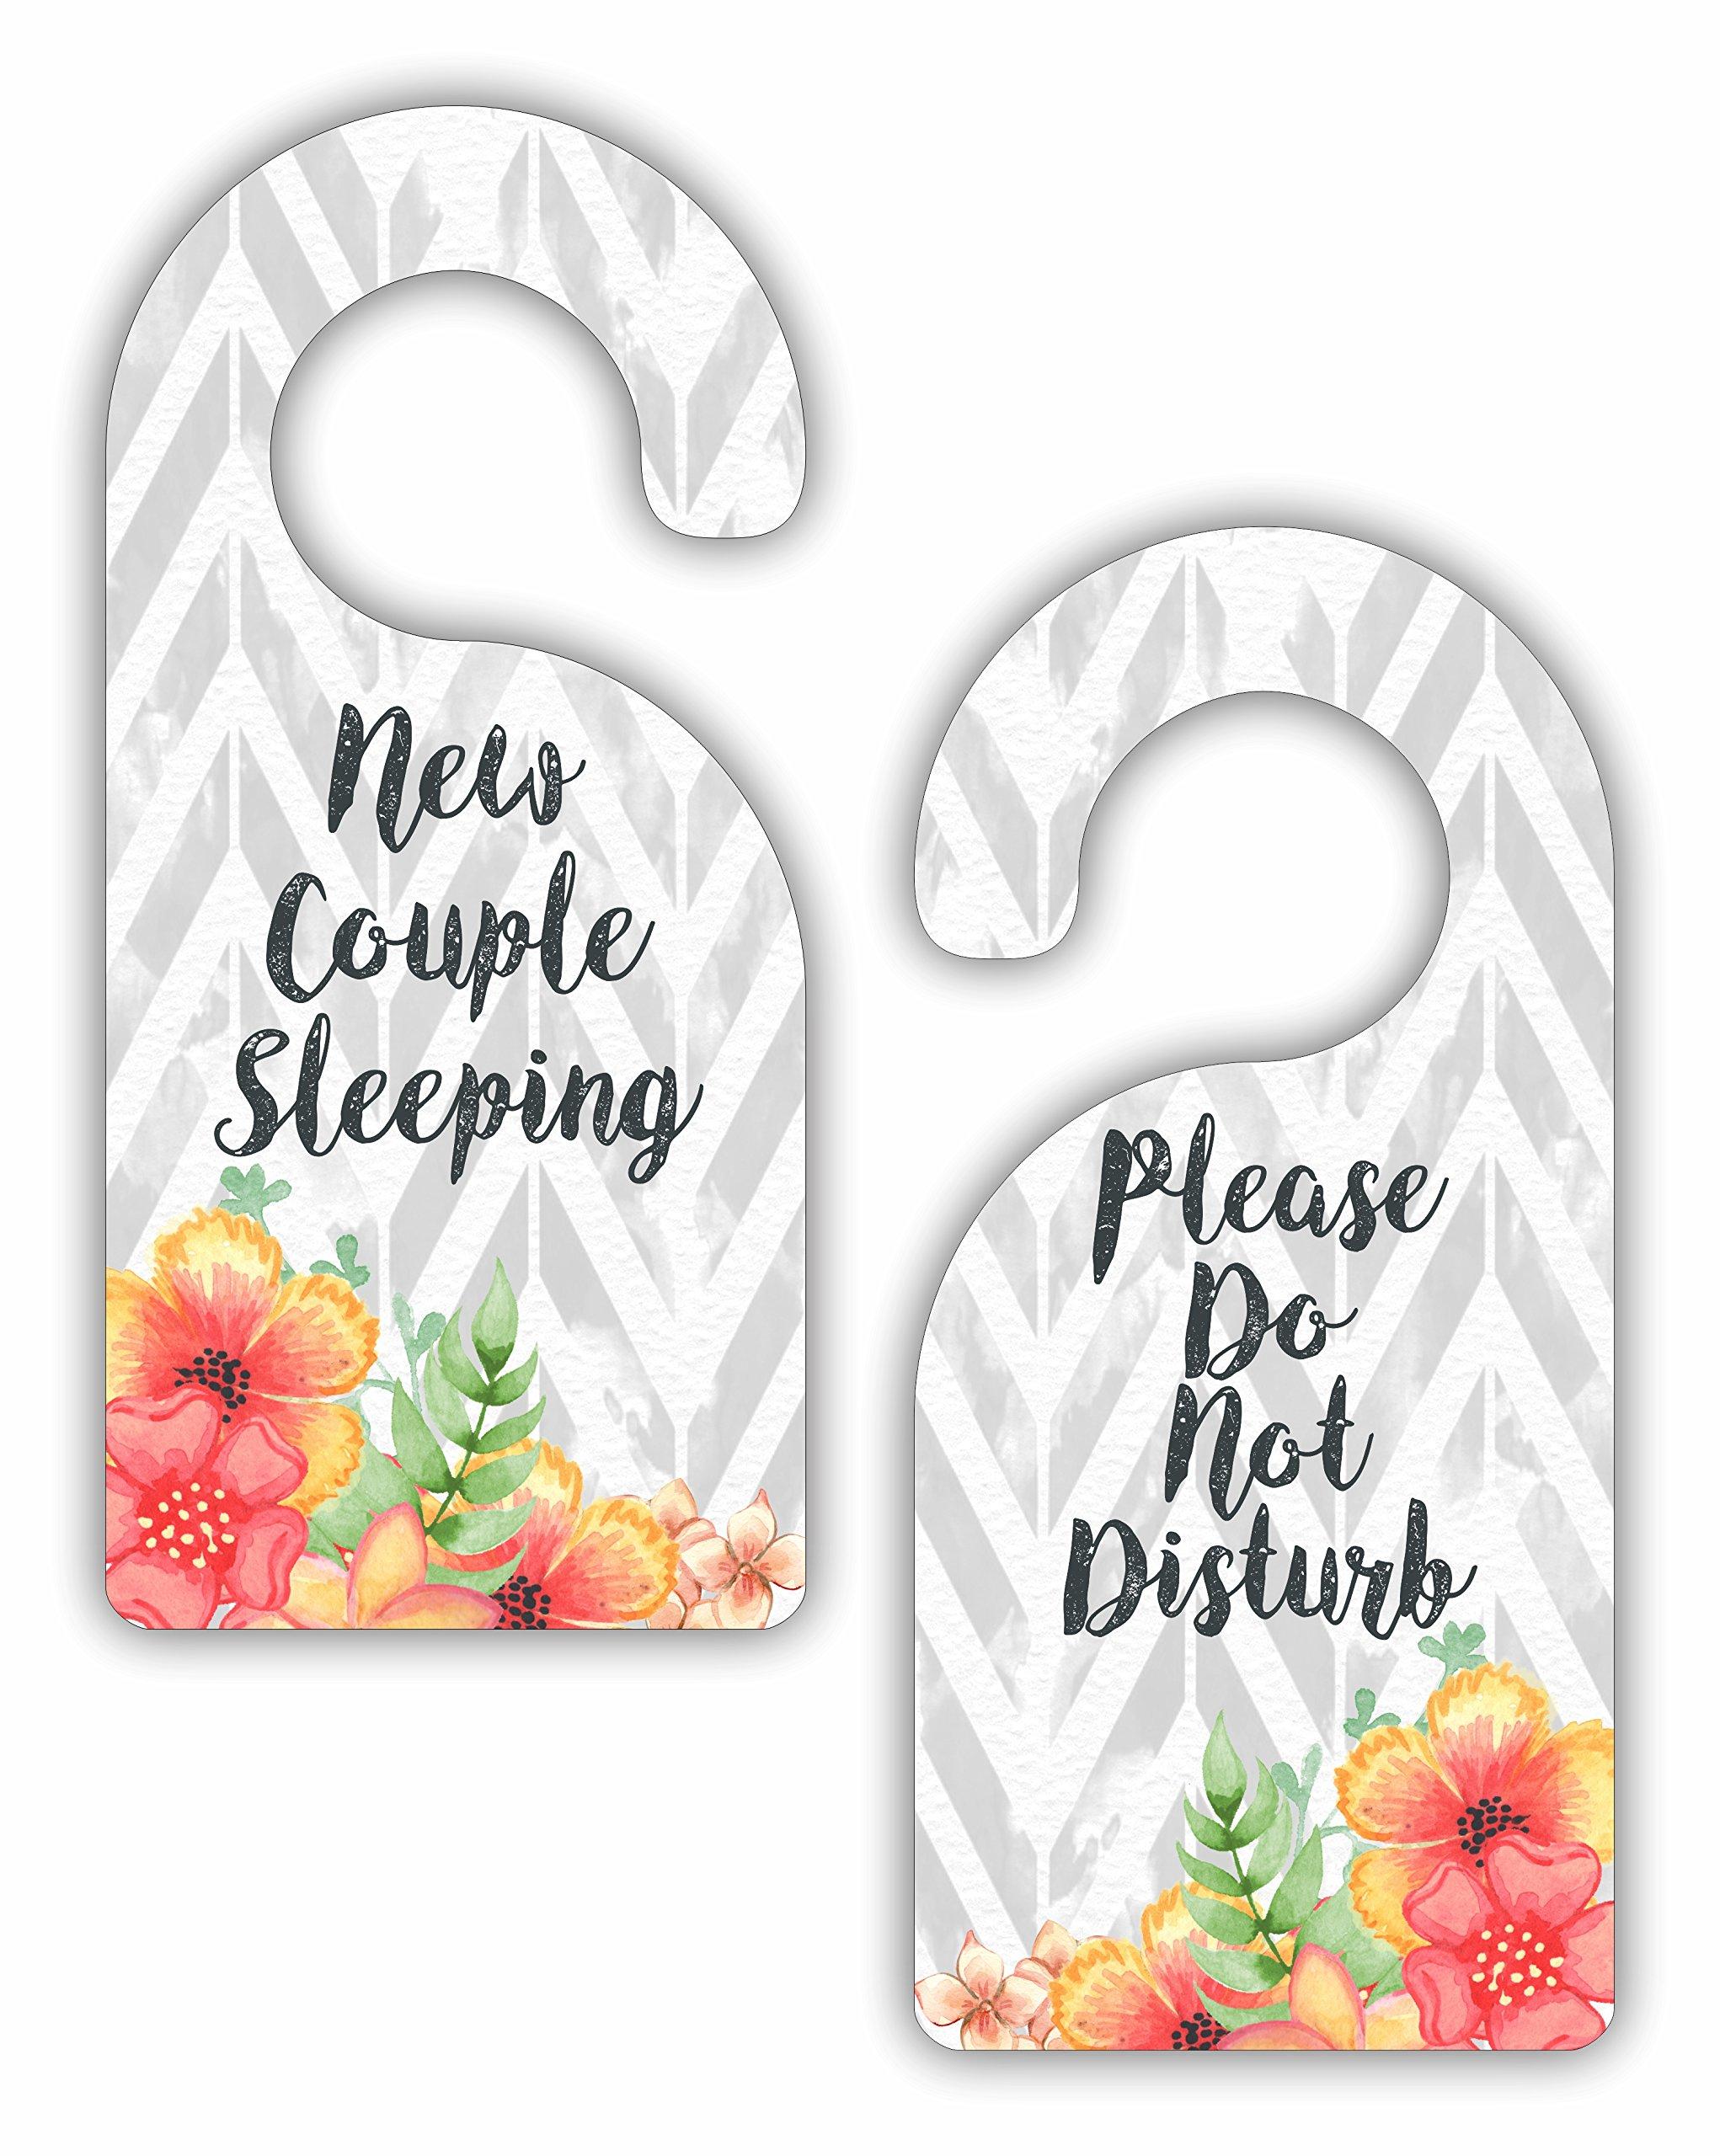 New Couple Sleeping - Please Do Not Disturb - Wedding Hotel / Bedroom / Room Door Sign Hanger Favor - Double Sided - Hard Plastic - Glossy Finish